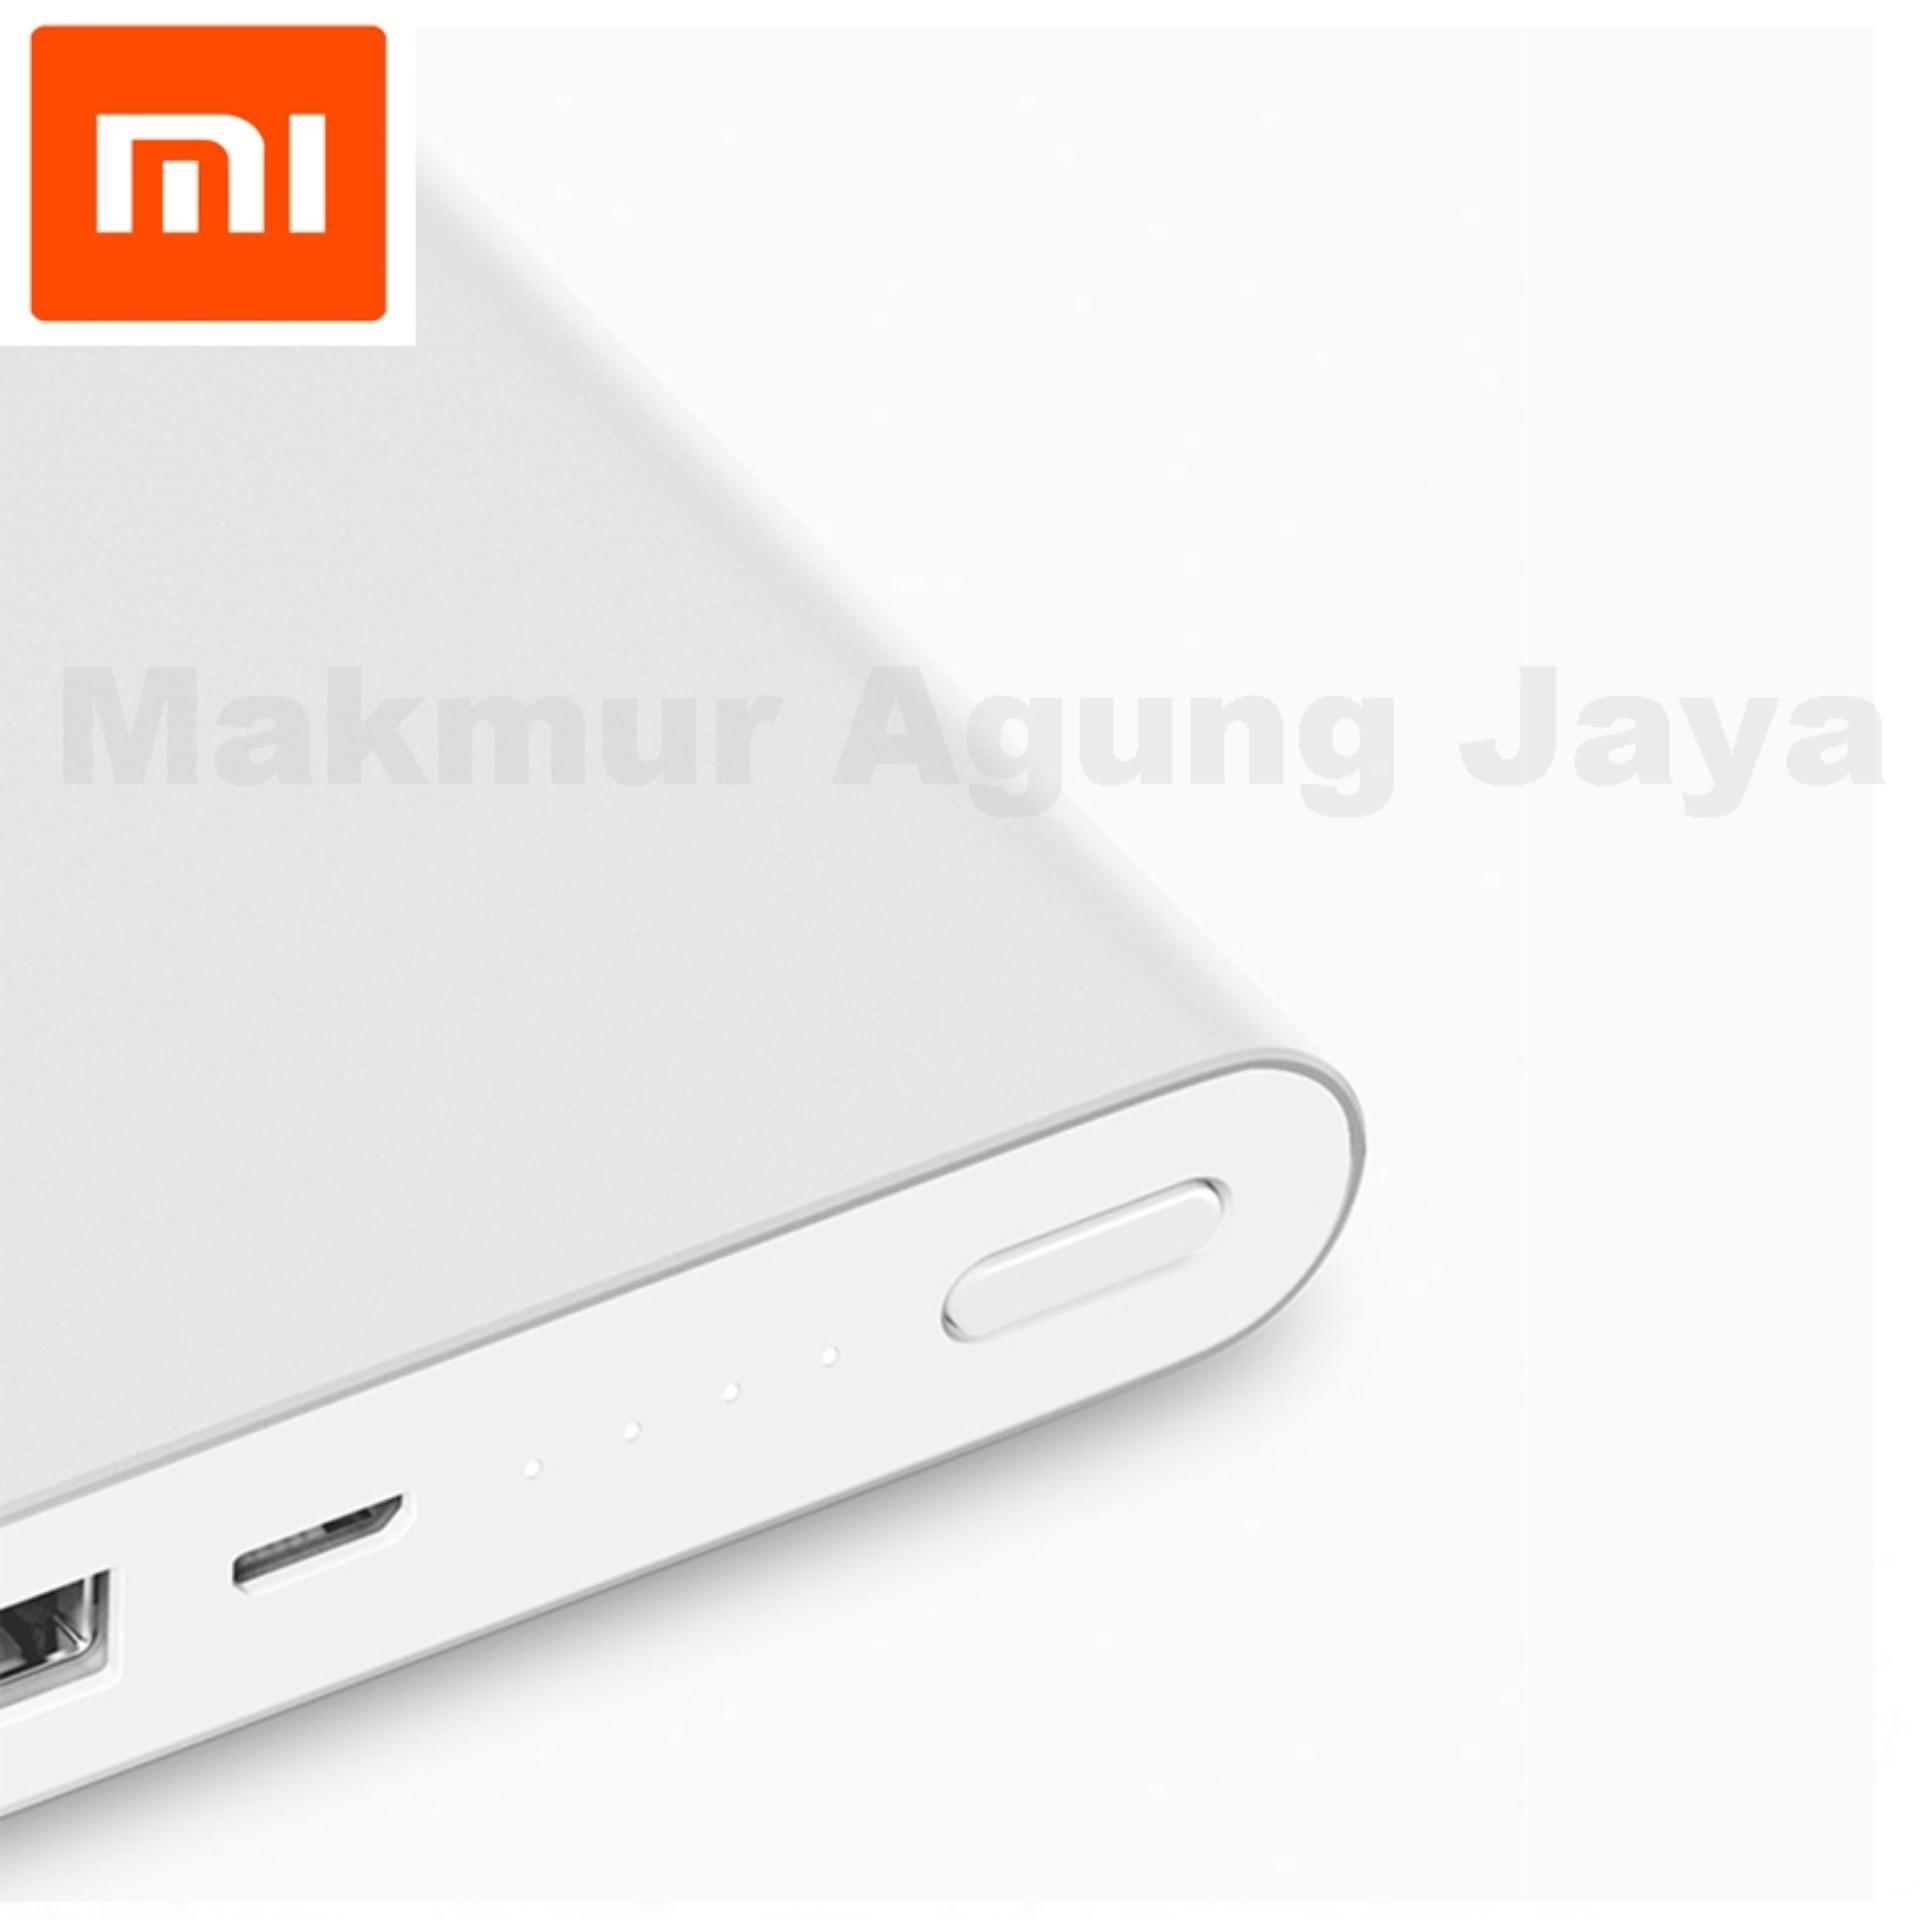 Diskon Penjualan Xiaomi Mi Power Bank 10000mah Slim Original White Powerbank 10000ma Putih Silver Free Usb Type